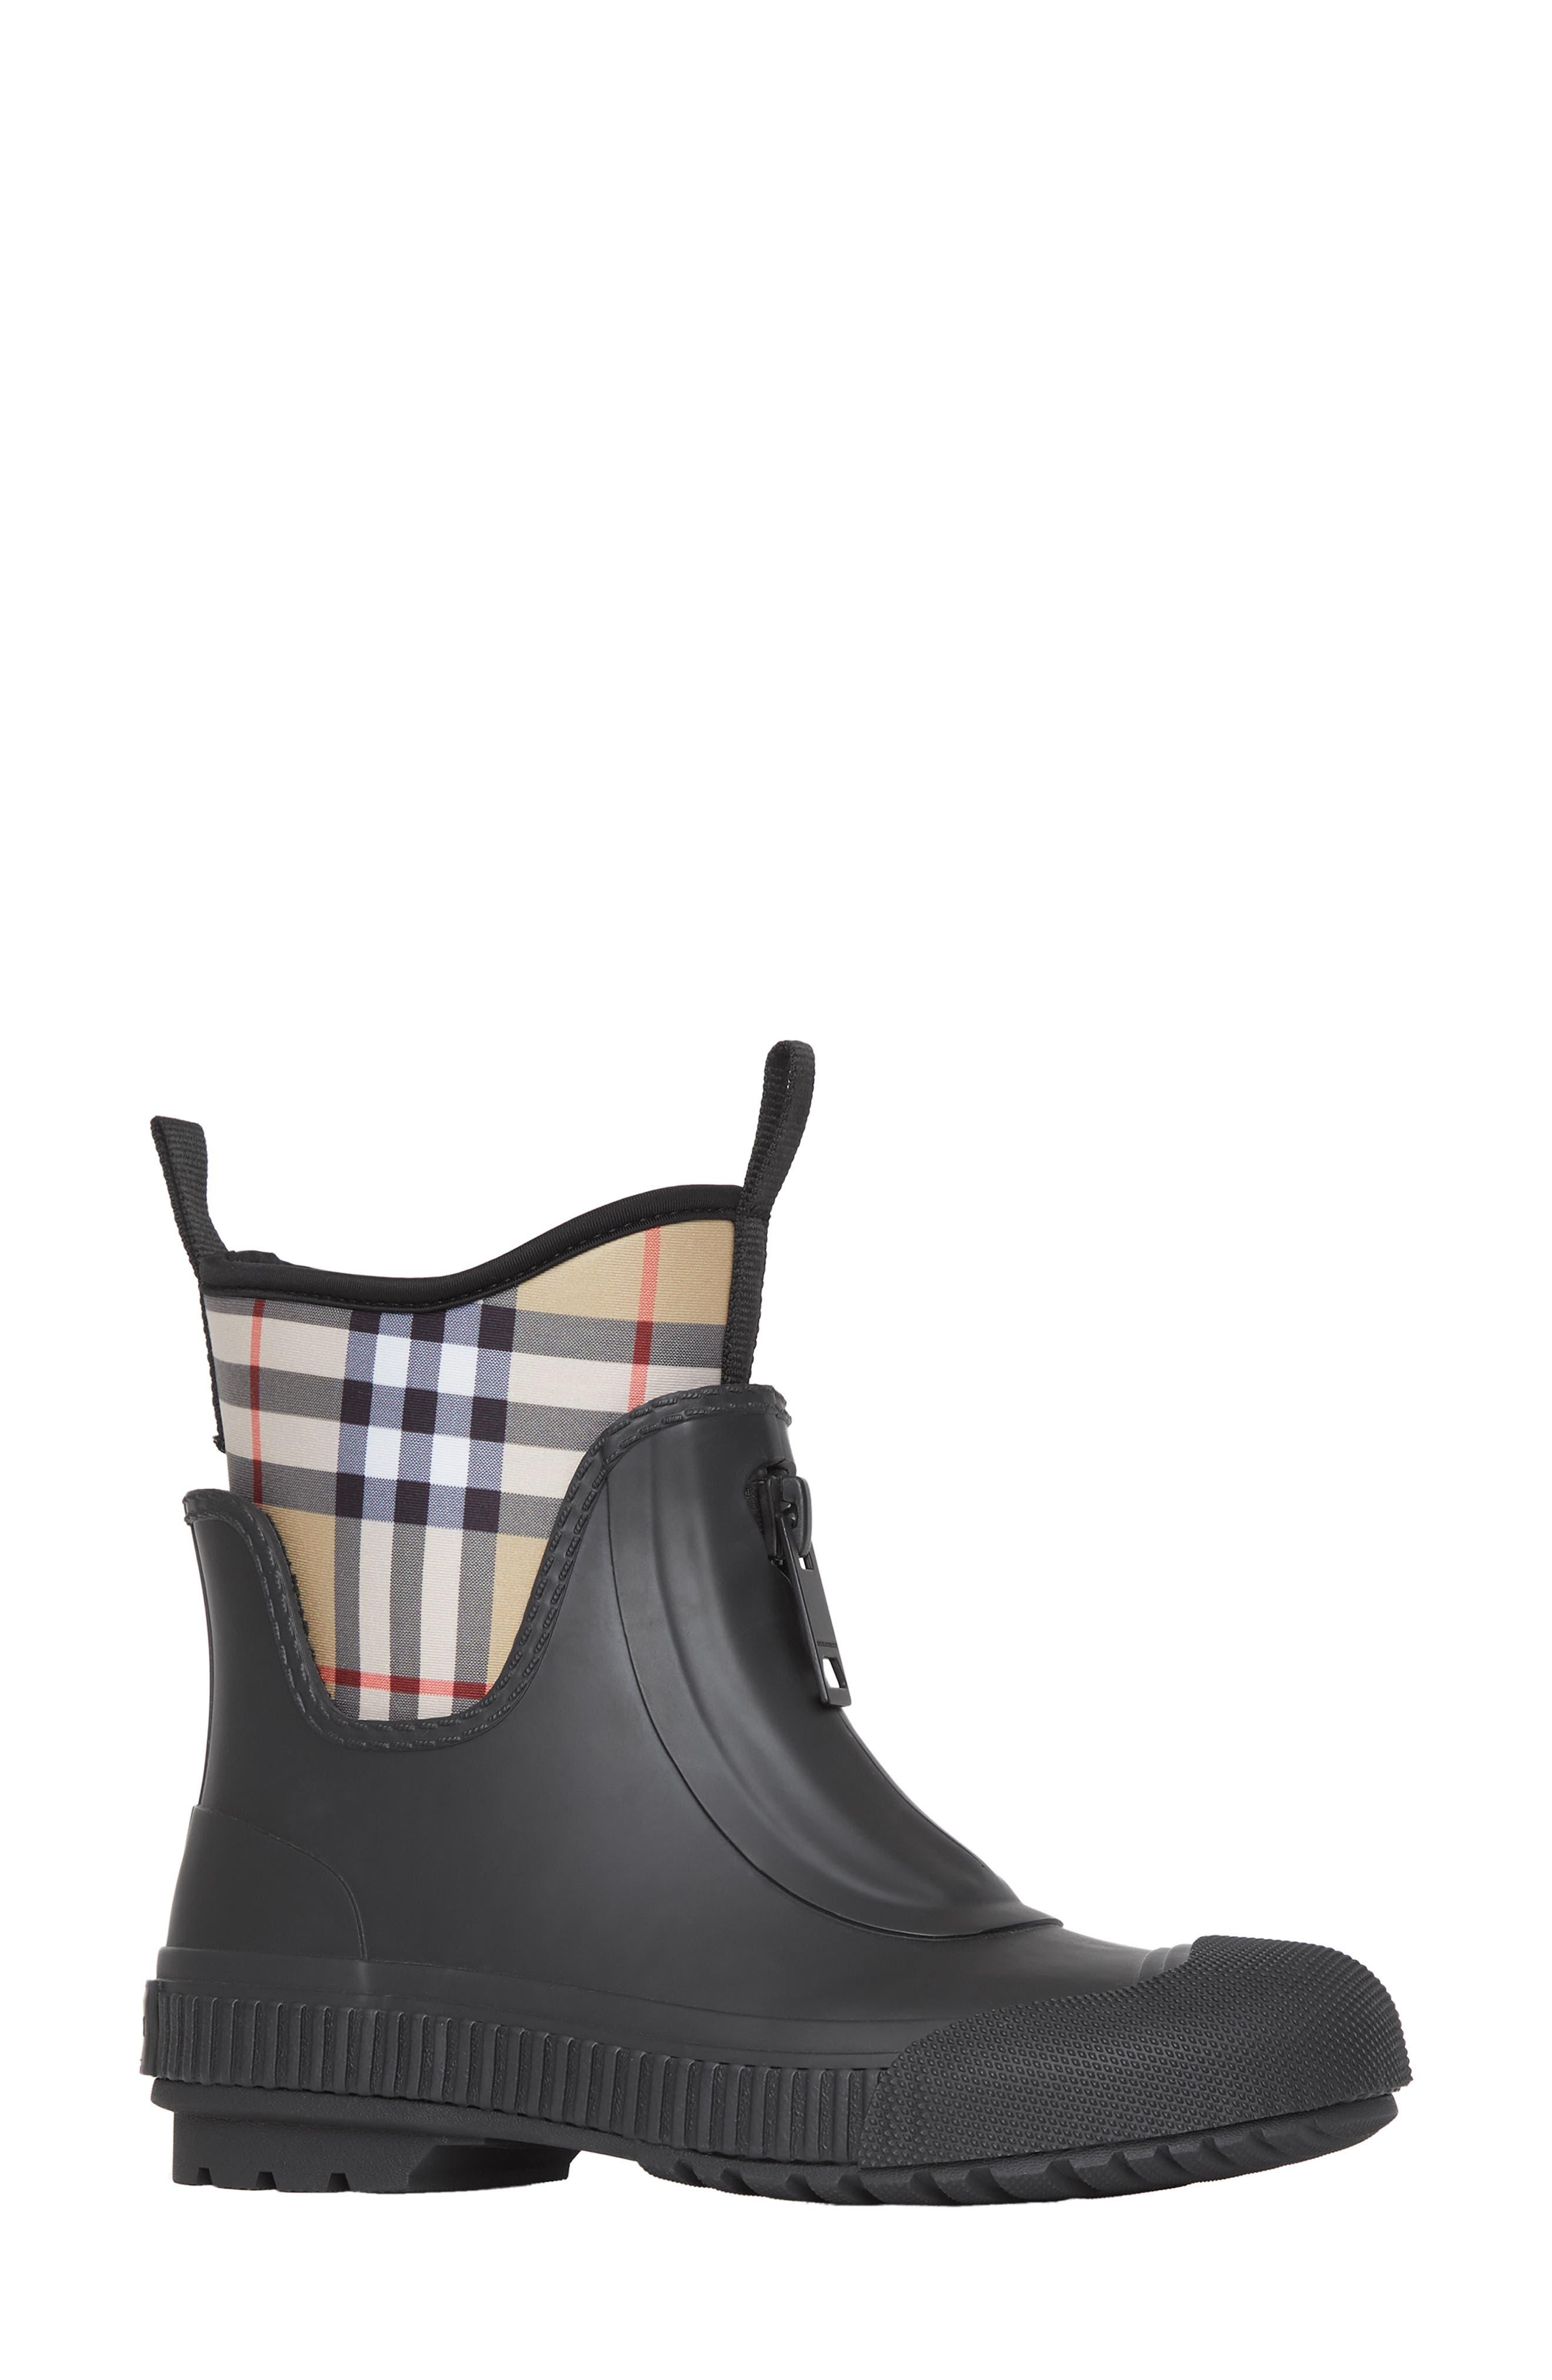 Burberry Flinton Check Waterproof Rain Boot, Black